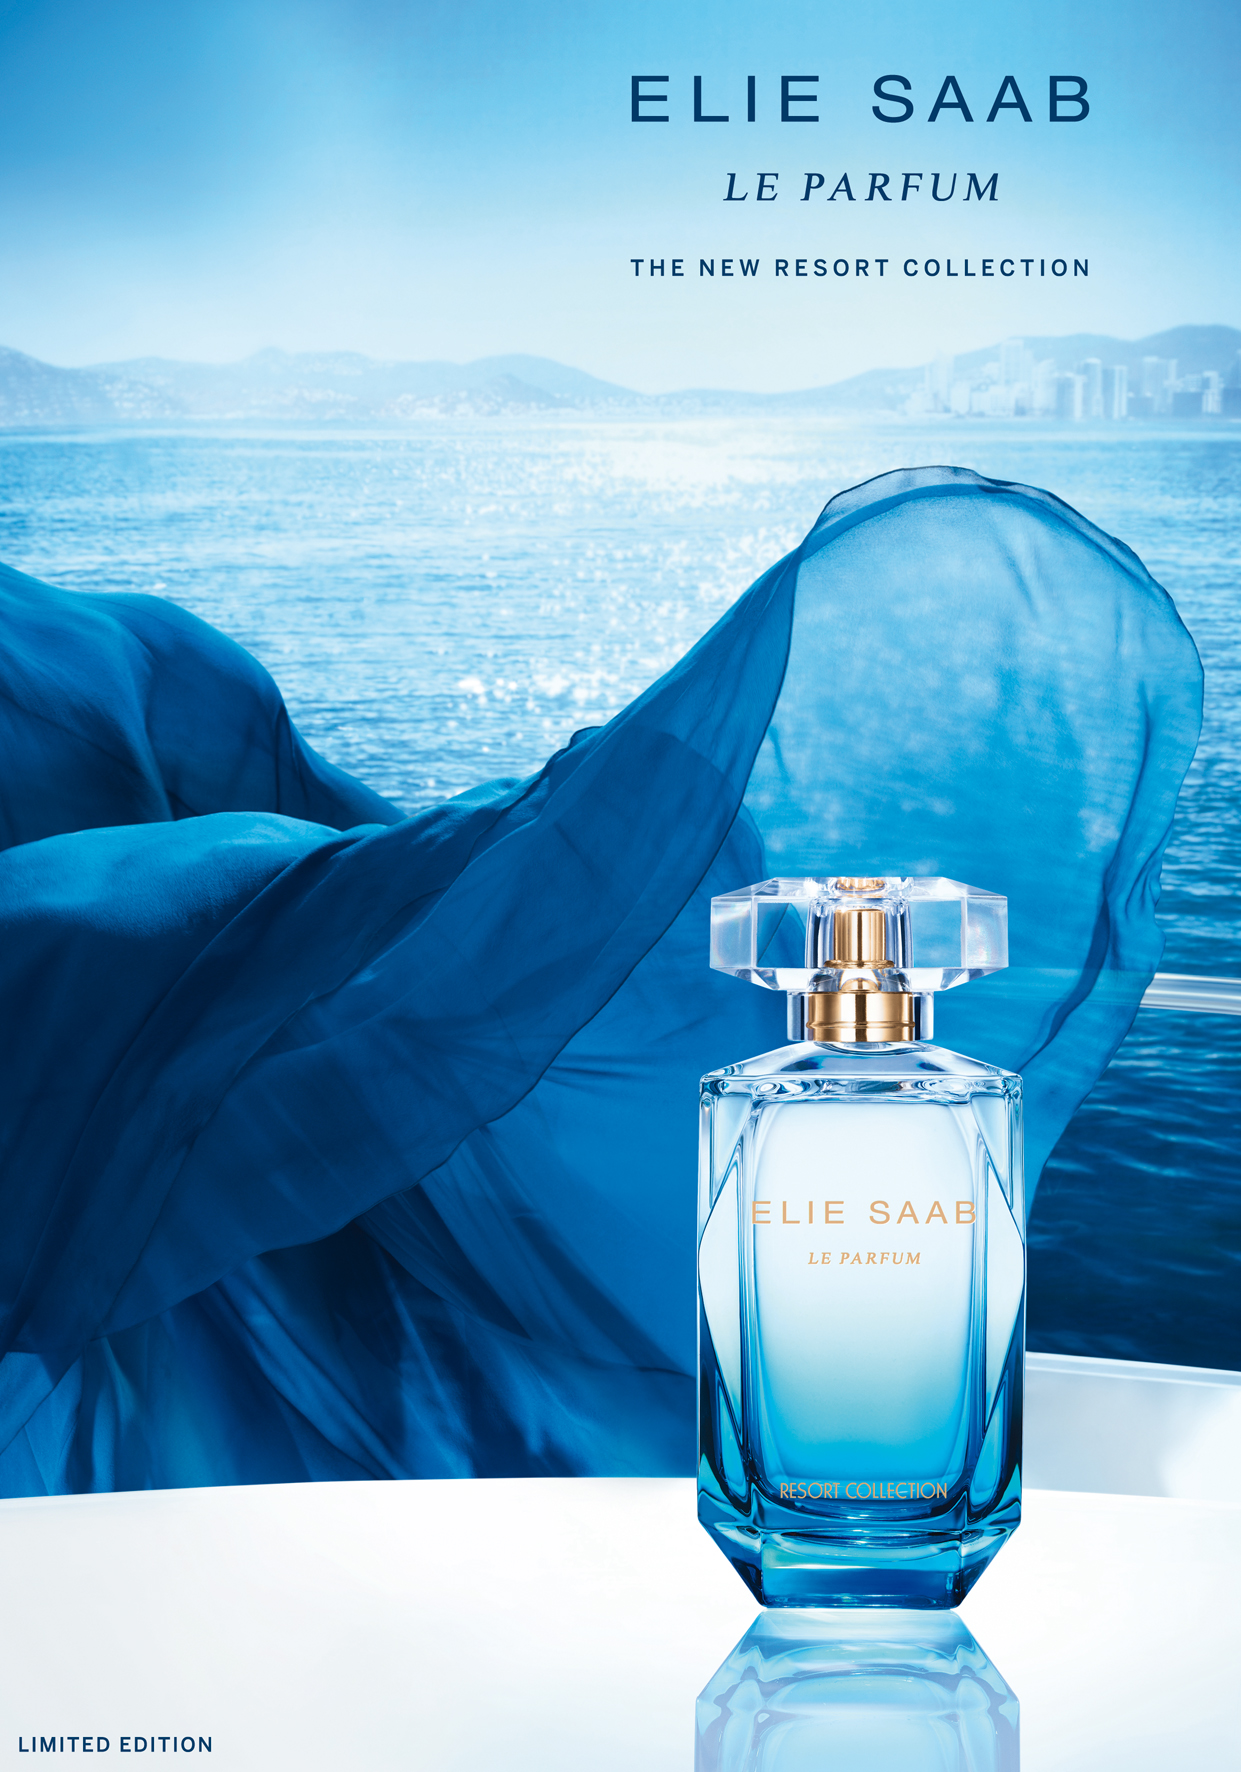 Resort Collection Elie Saab Le Parfum